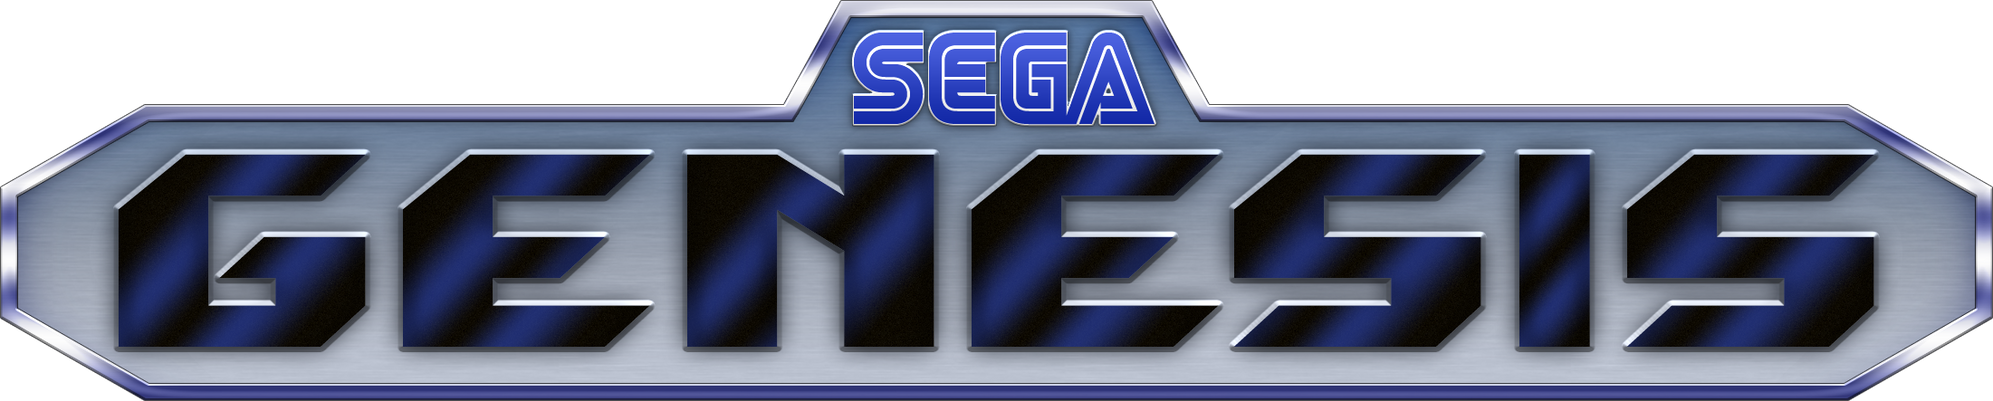 Sega Genesis Logo by B...